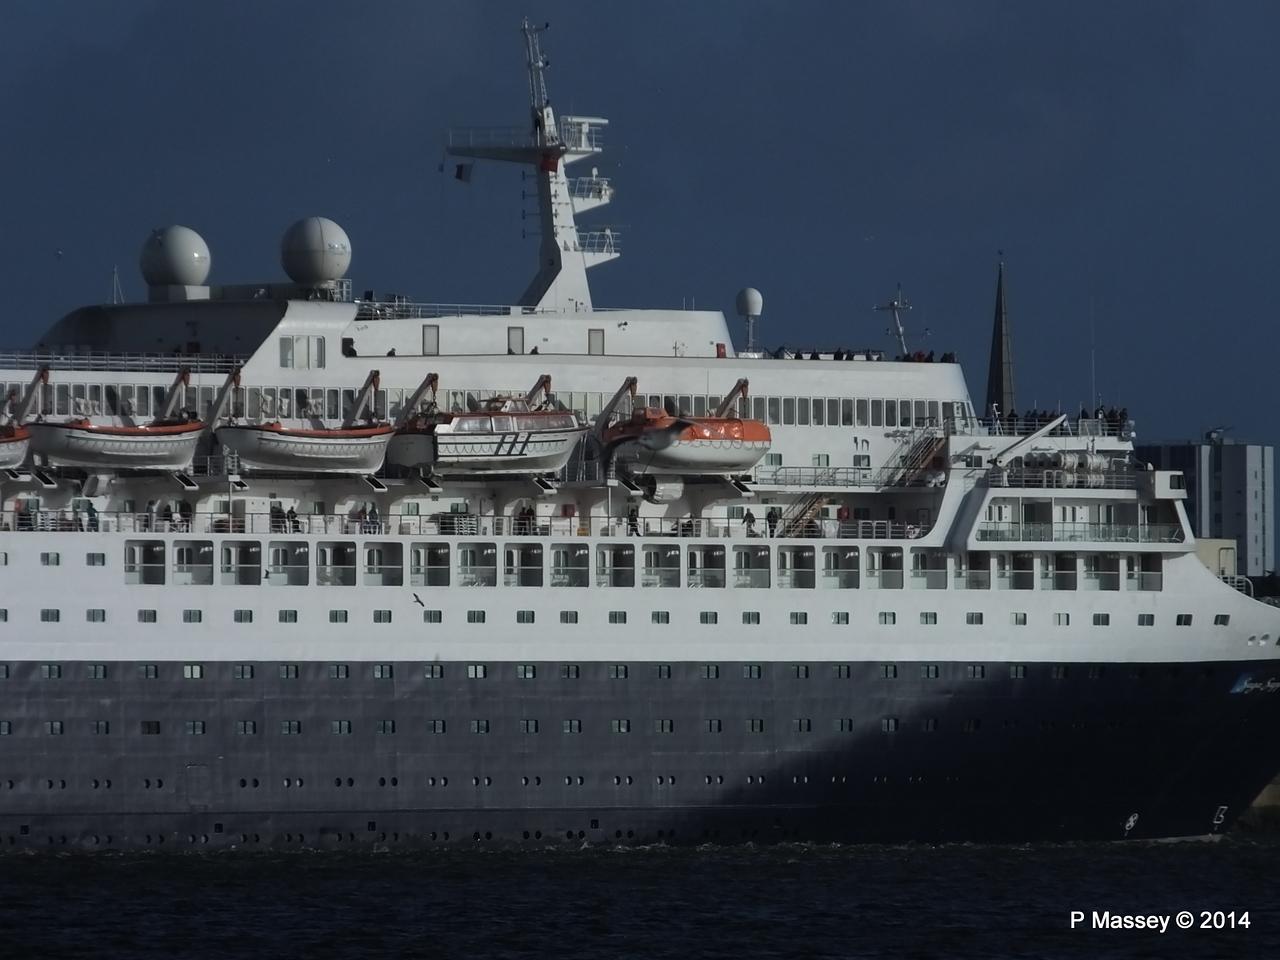 SAGA SAPPHIRE Departing Southampton PDM 07-01-2014 12-18-26